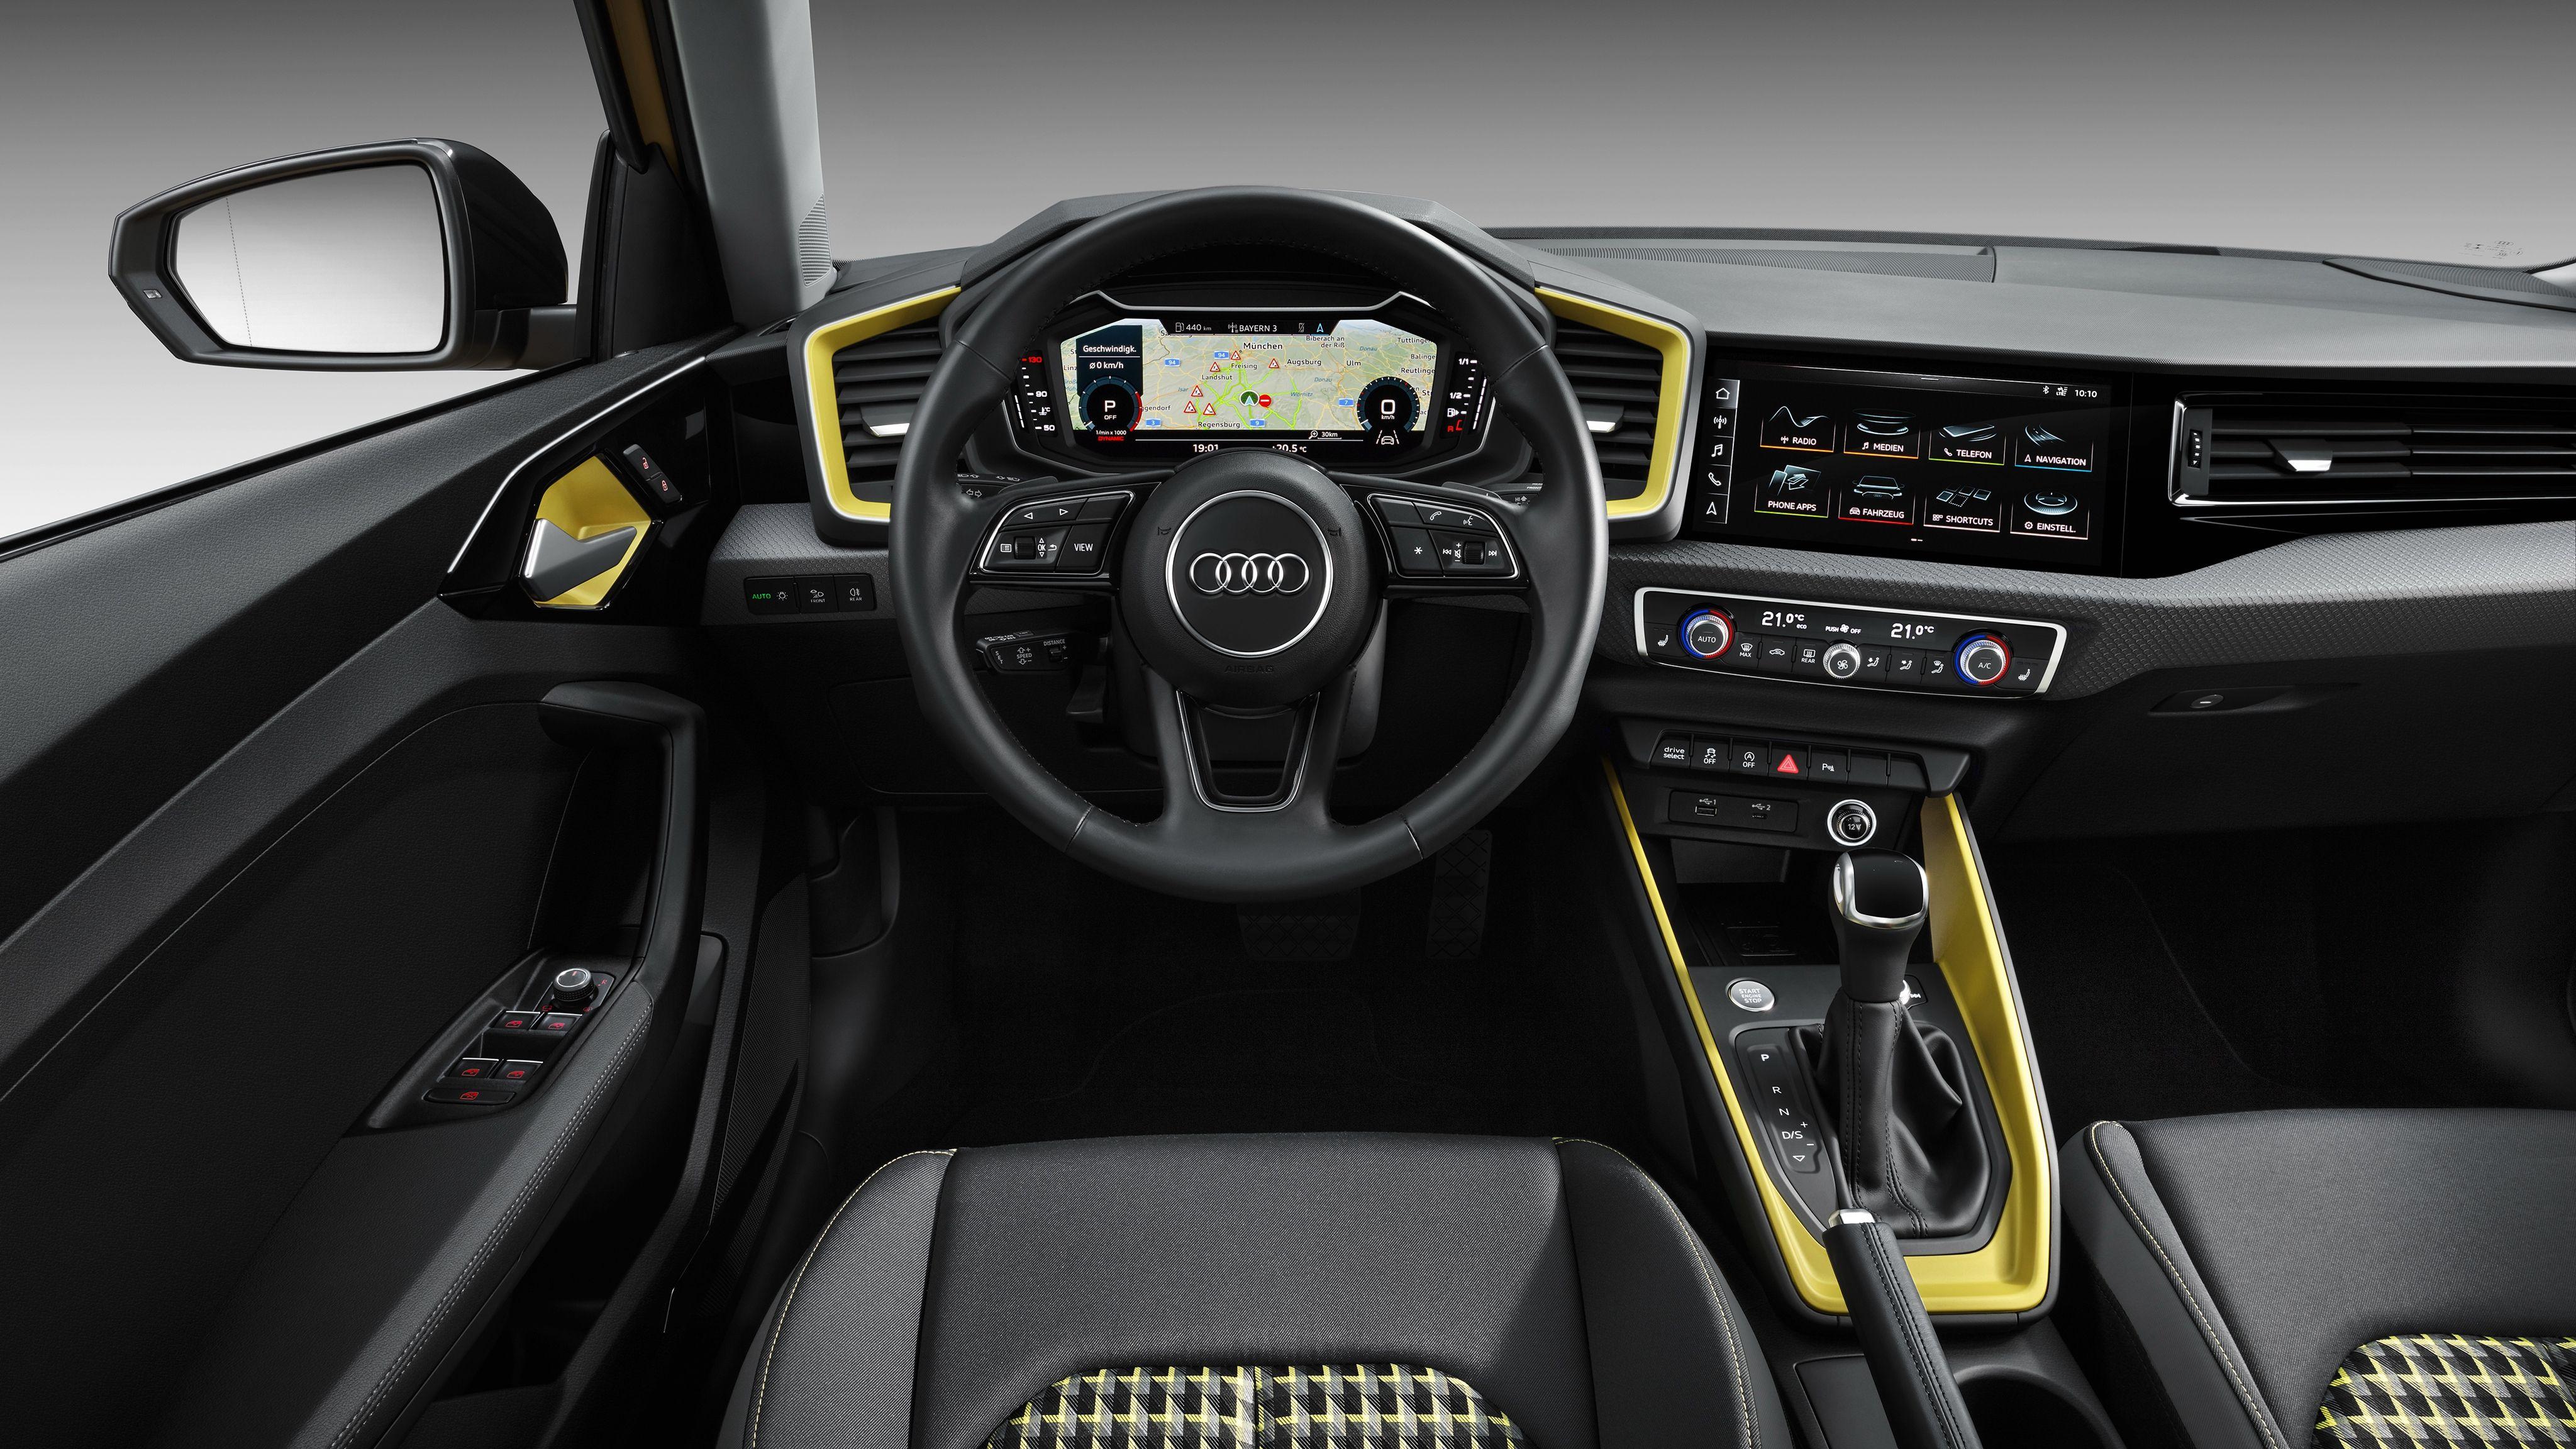 Audi A1 Sportback 40 TFSI S line '2018 Audi a1 sportback